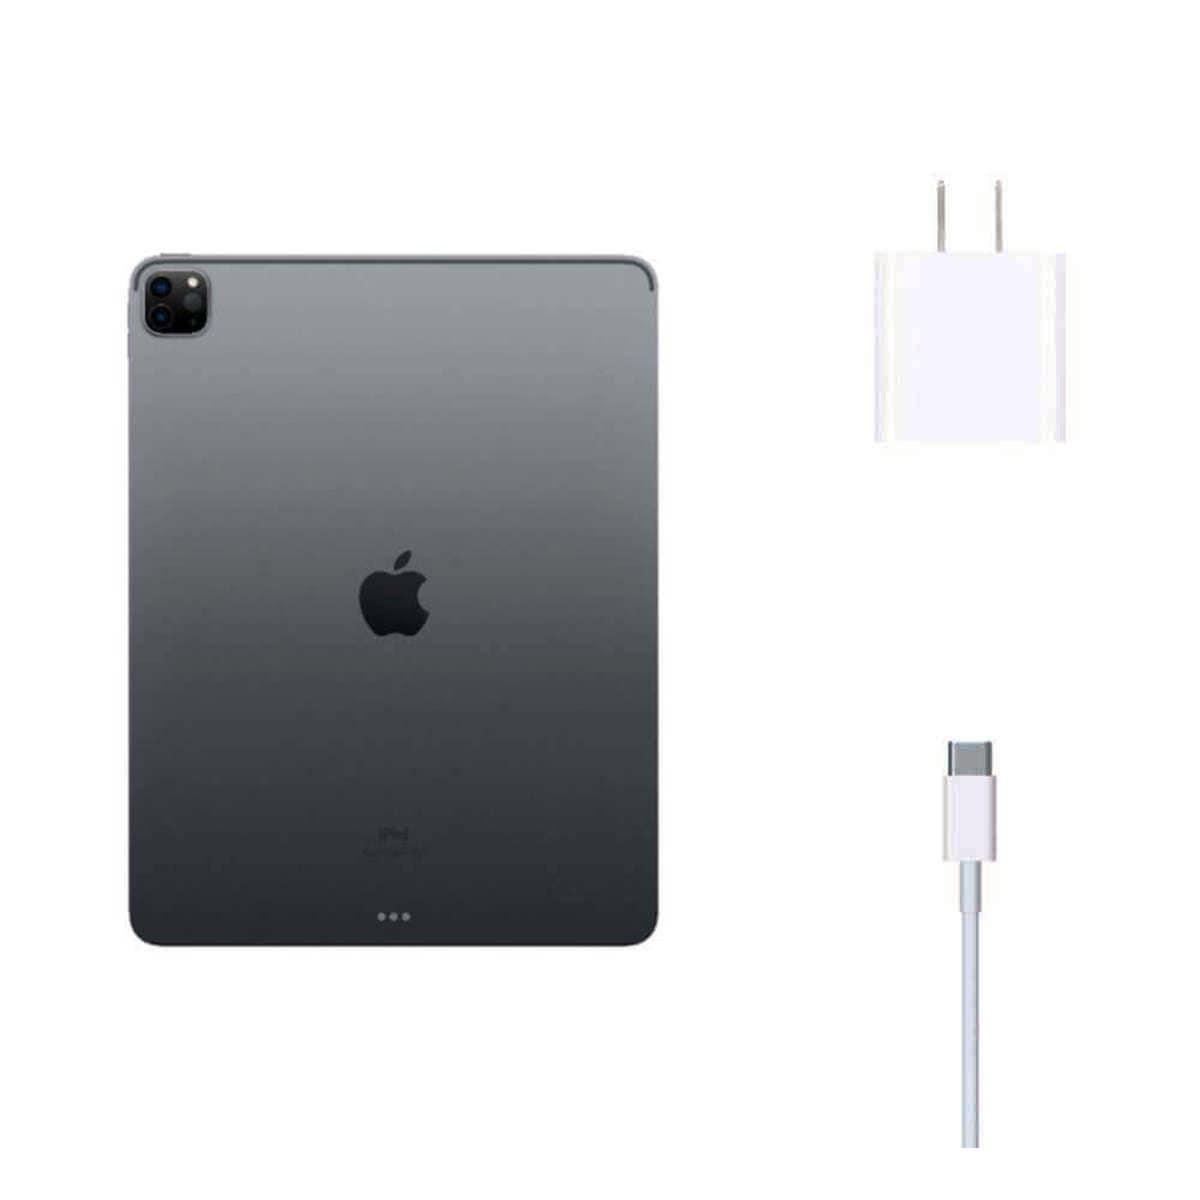 iPad Pro 11 128 GB Space Gray-LAE